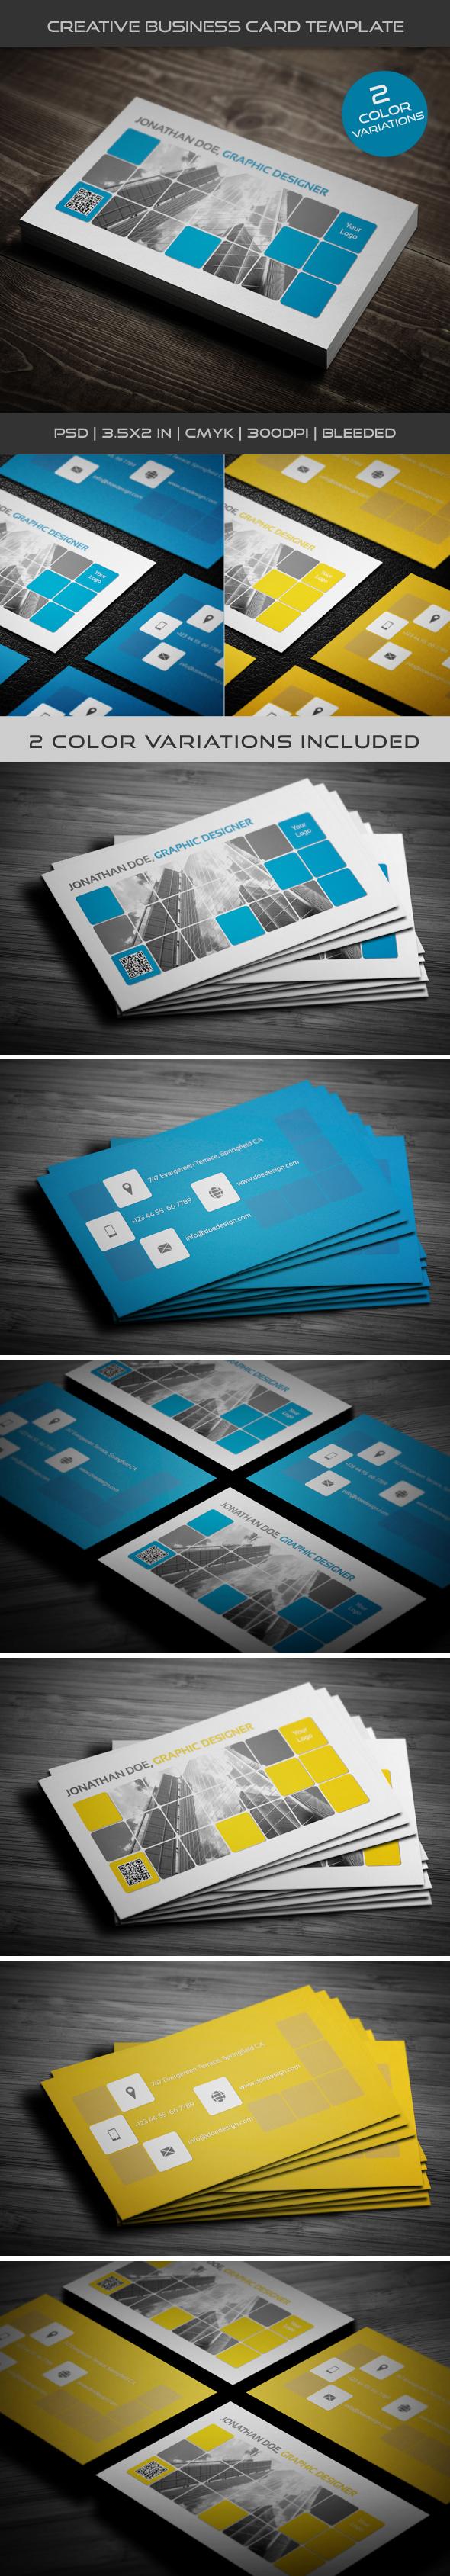 Creative Business Card Template 04